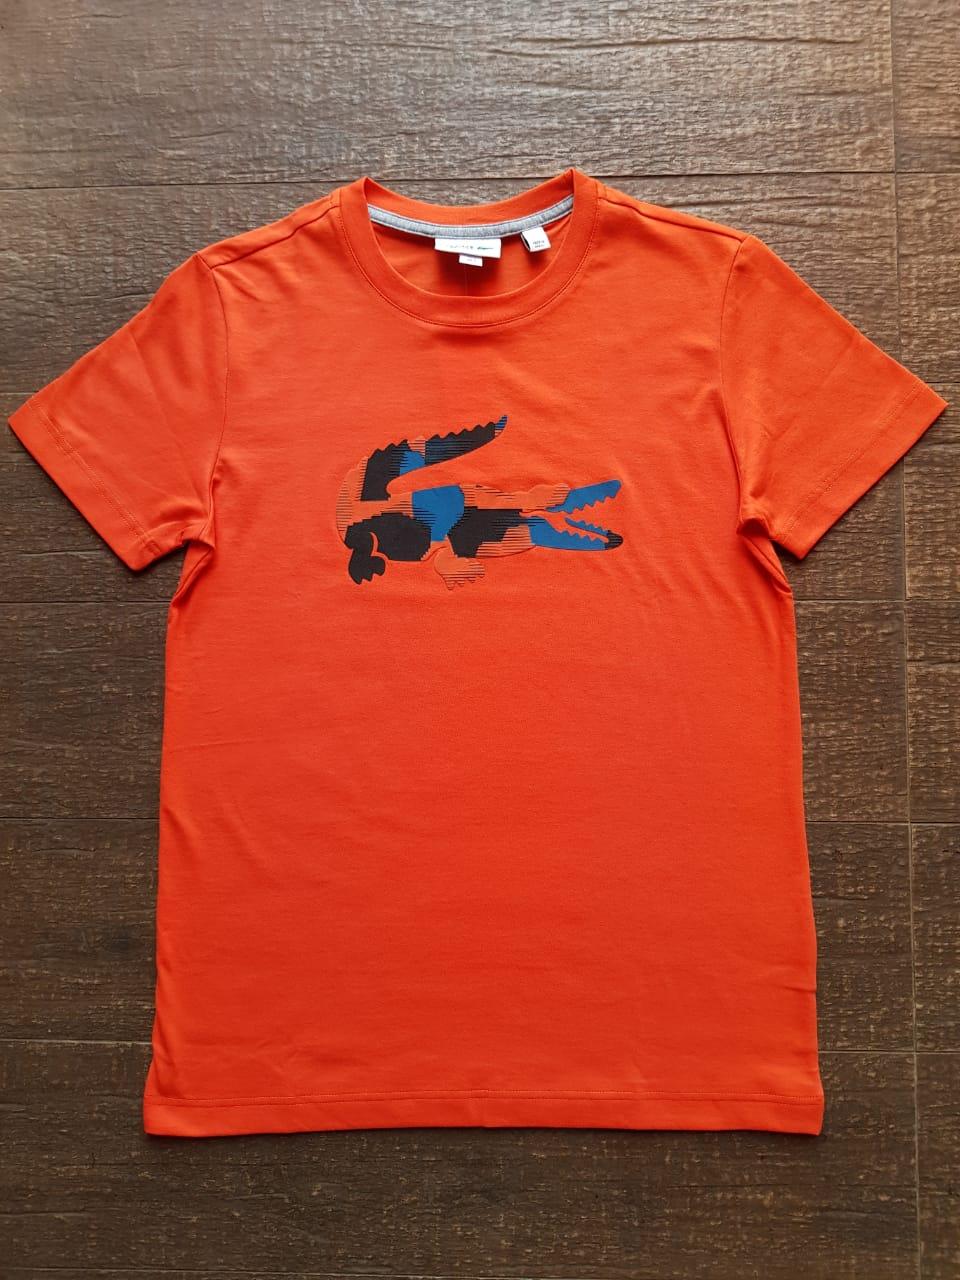 Camiseta Lacoste Masculina TH7253 Laranja